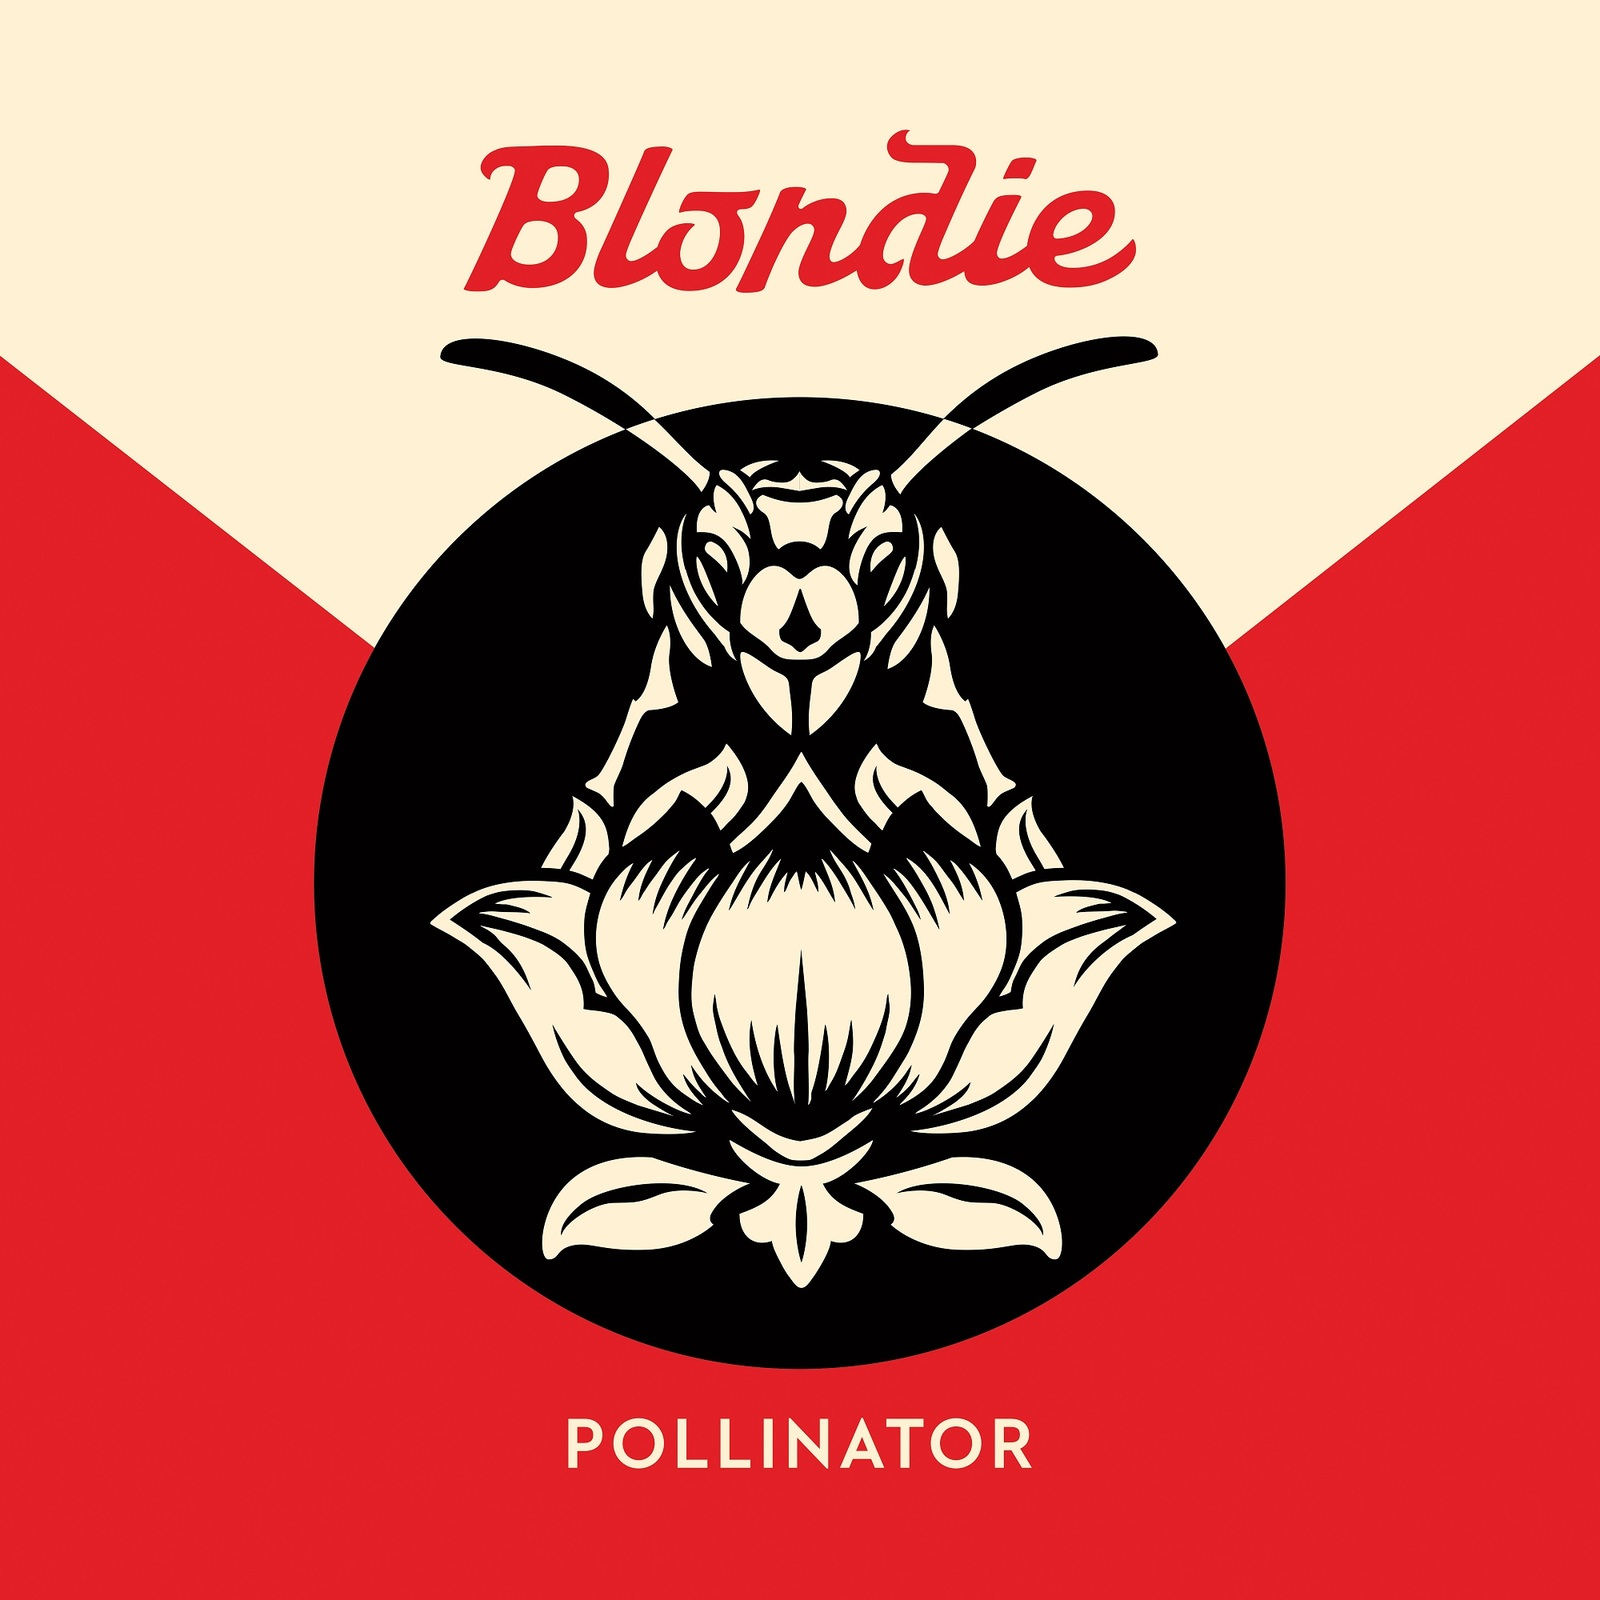 Pollinator by Blondie image